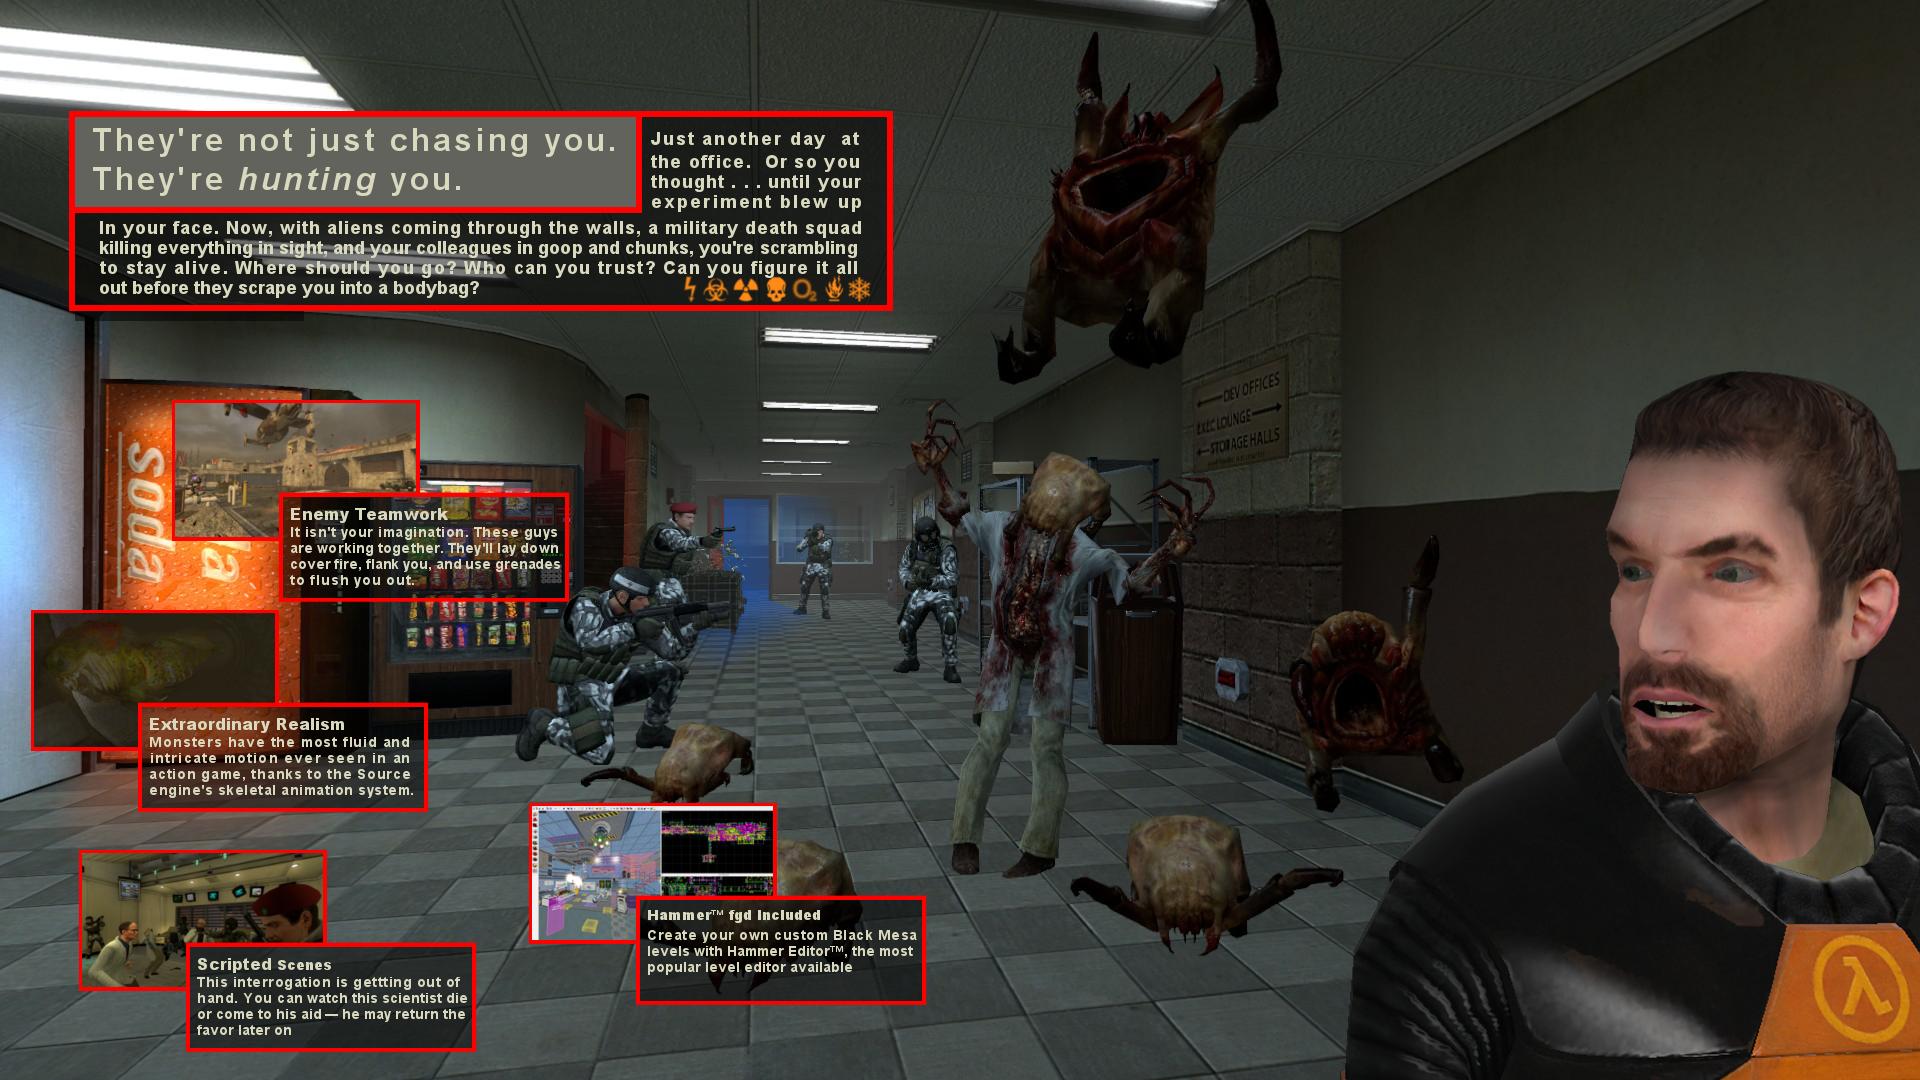 Party Wallpaper Hd Black Mesa Wallpapers In Ultra Hd 4k Gameranx